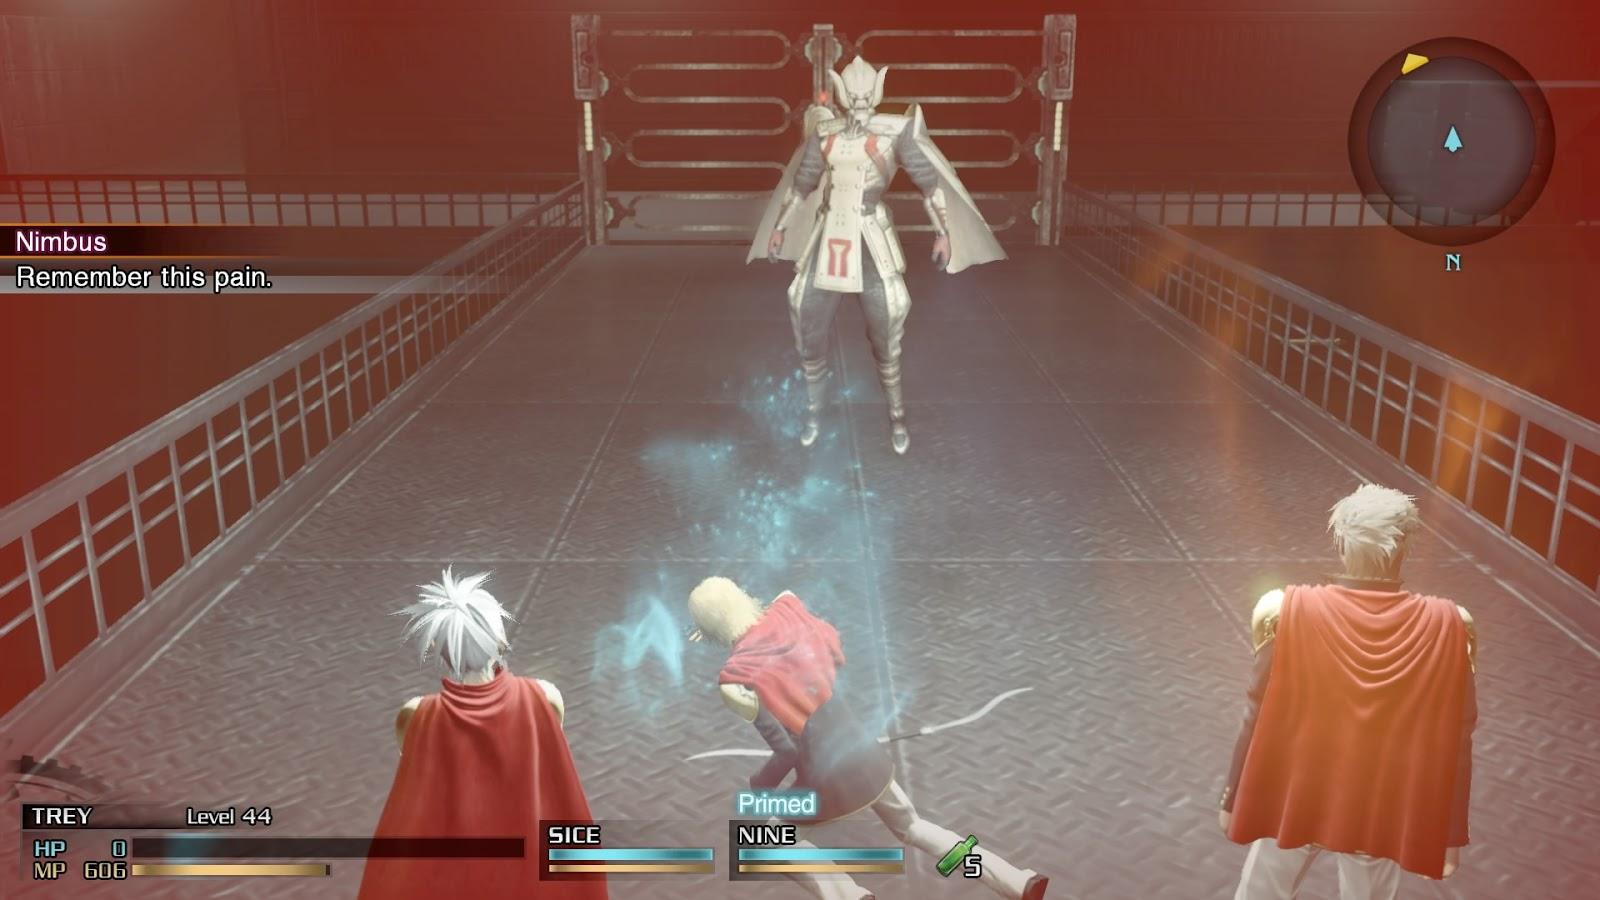 To quote shigeru miyamoto never take control away from the player during regular gameplay